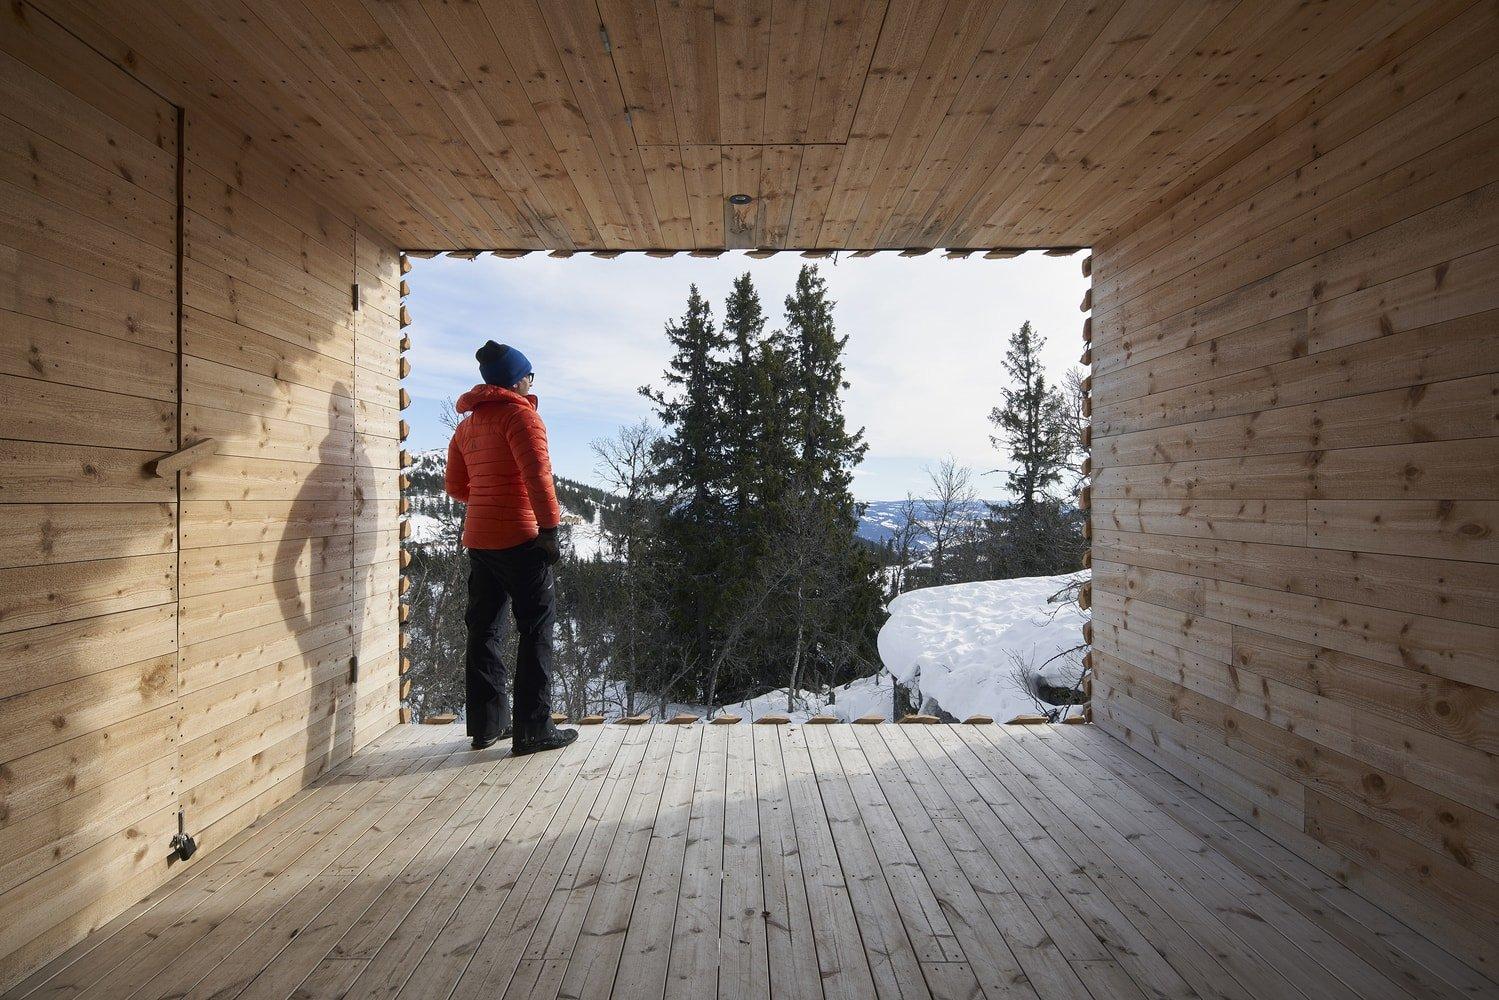 Eco Edition_Mork-Unes Architects_Skigard_Architecture interiors 9-min